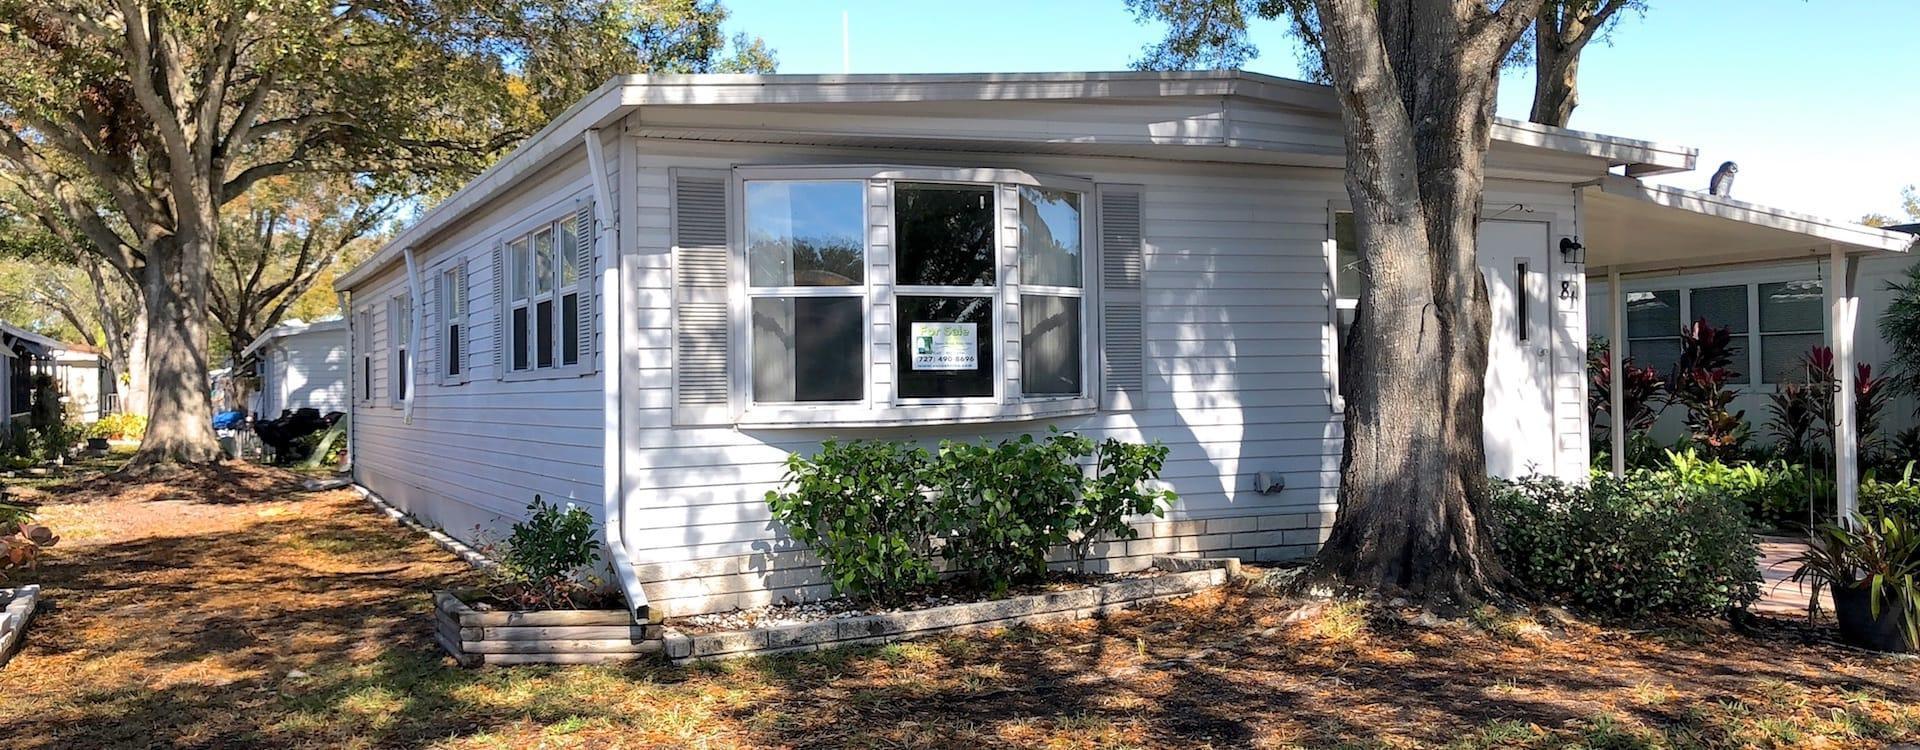 Mobile Home Parks Hillsborough County Fl